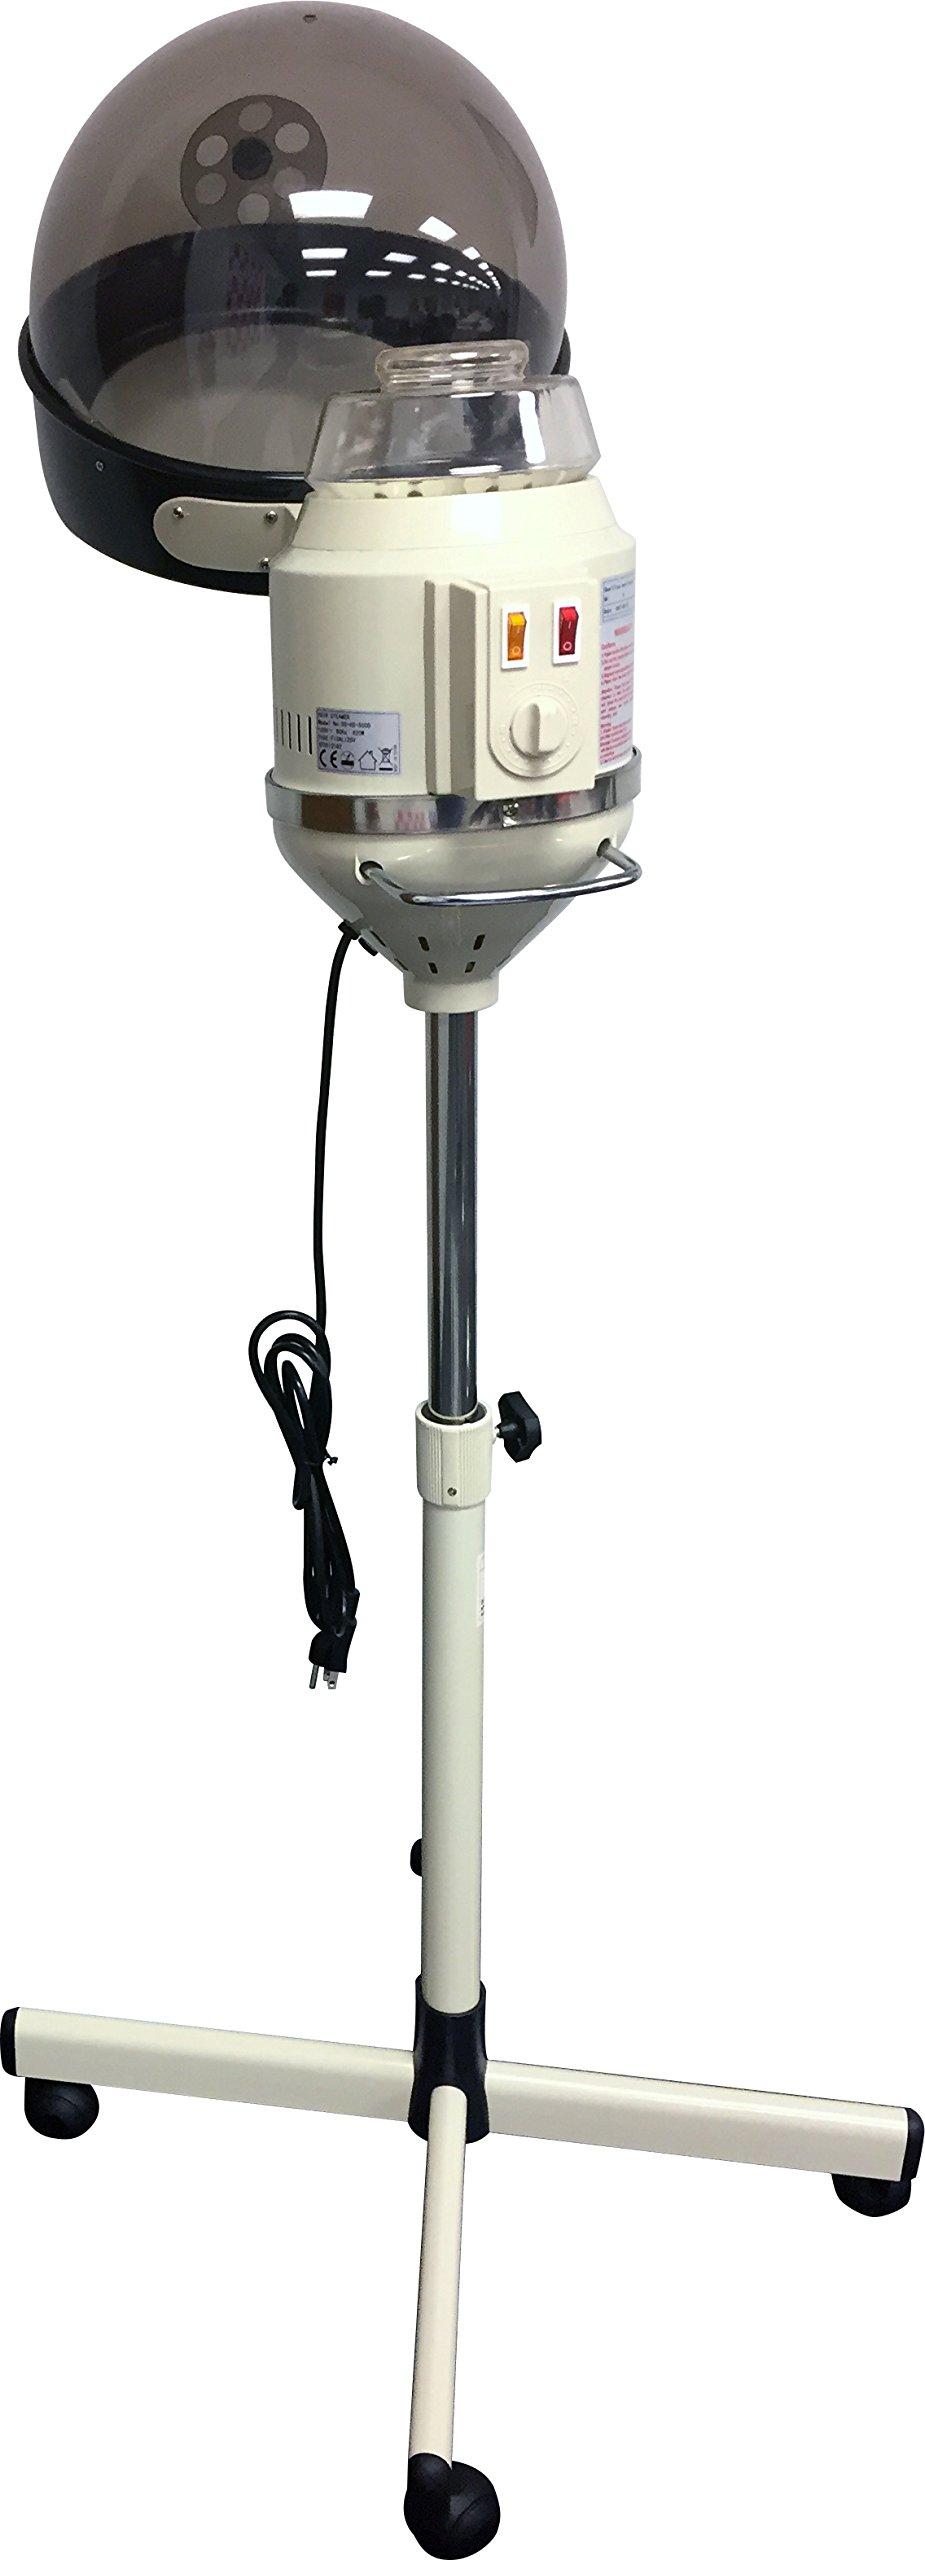 D Salon Portable Professional Salon Hair Steamer With Rolling Stand Base Hood Salon Beauty Spa by D Salon (Image #5)